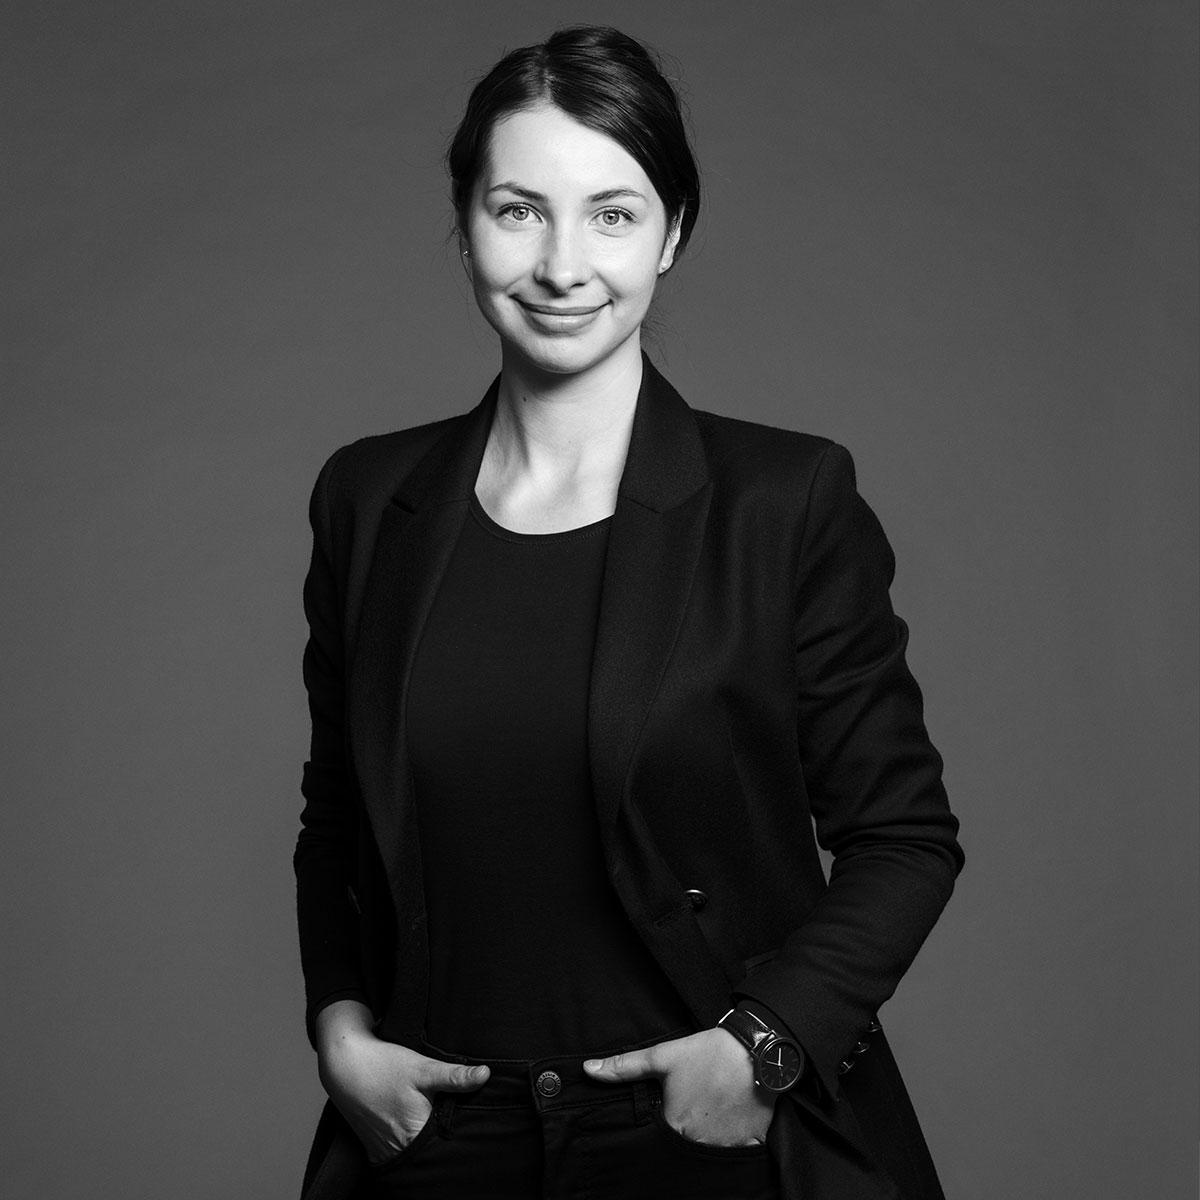 Lidia Wasik